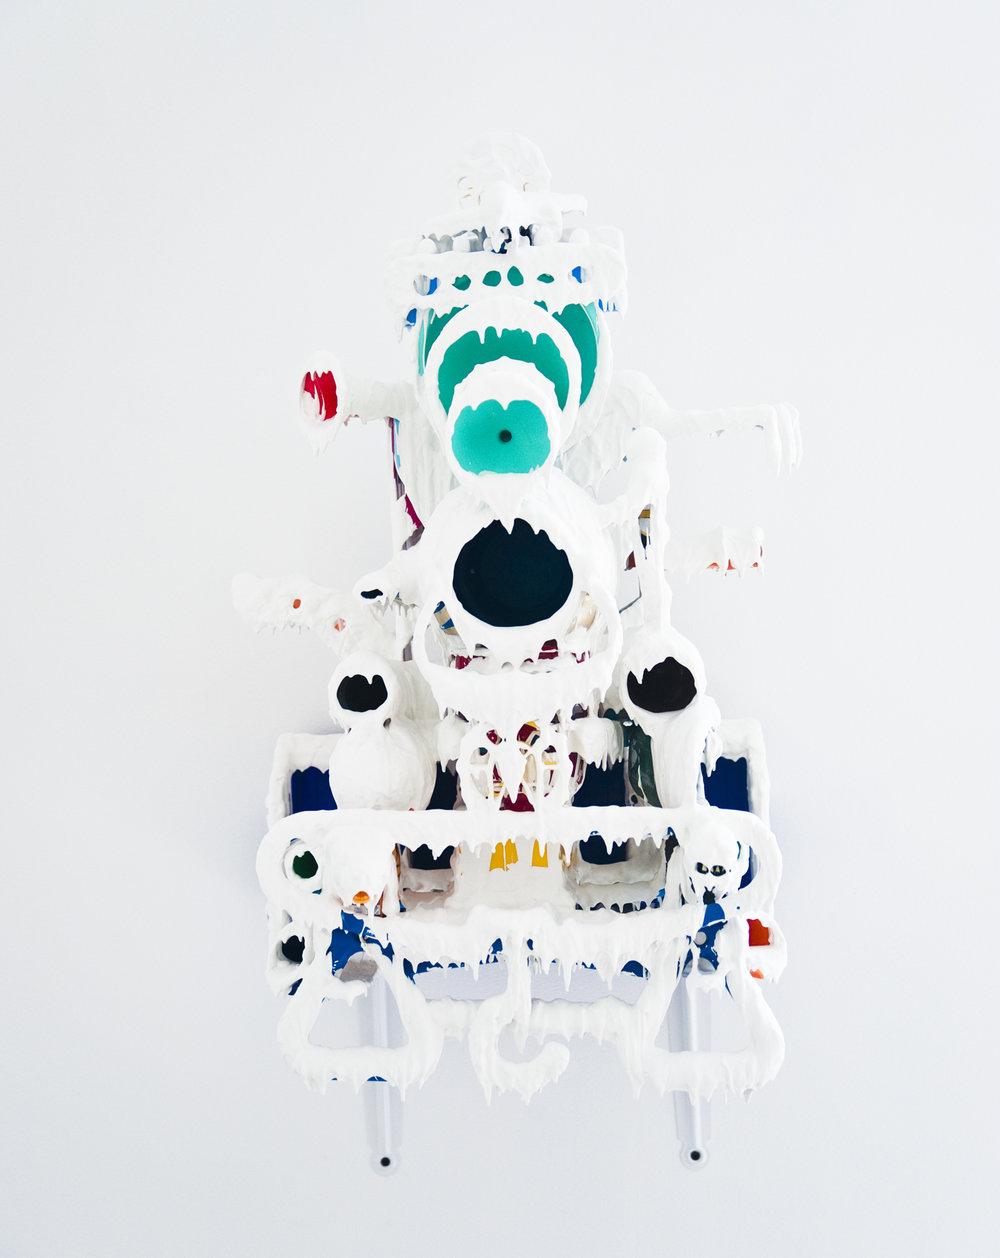 Teppei Kaneuji, White Discharge (Built-up Objects)#37 , 2014, wood,plastic,steel,resin, 78.7x49x38.1cm Photo: Ilja Tschanen, courtesy:Jane Lombard Gallery